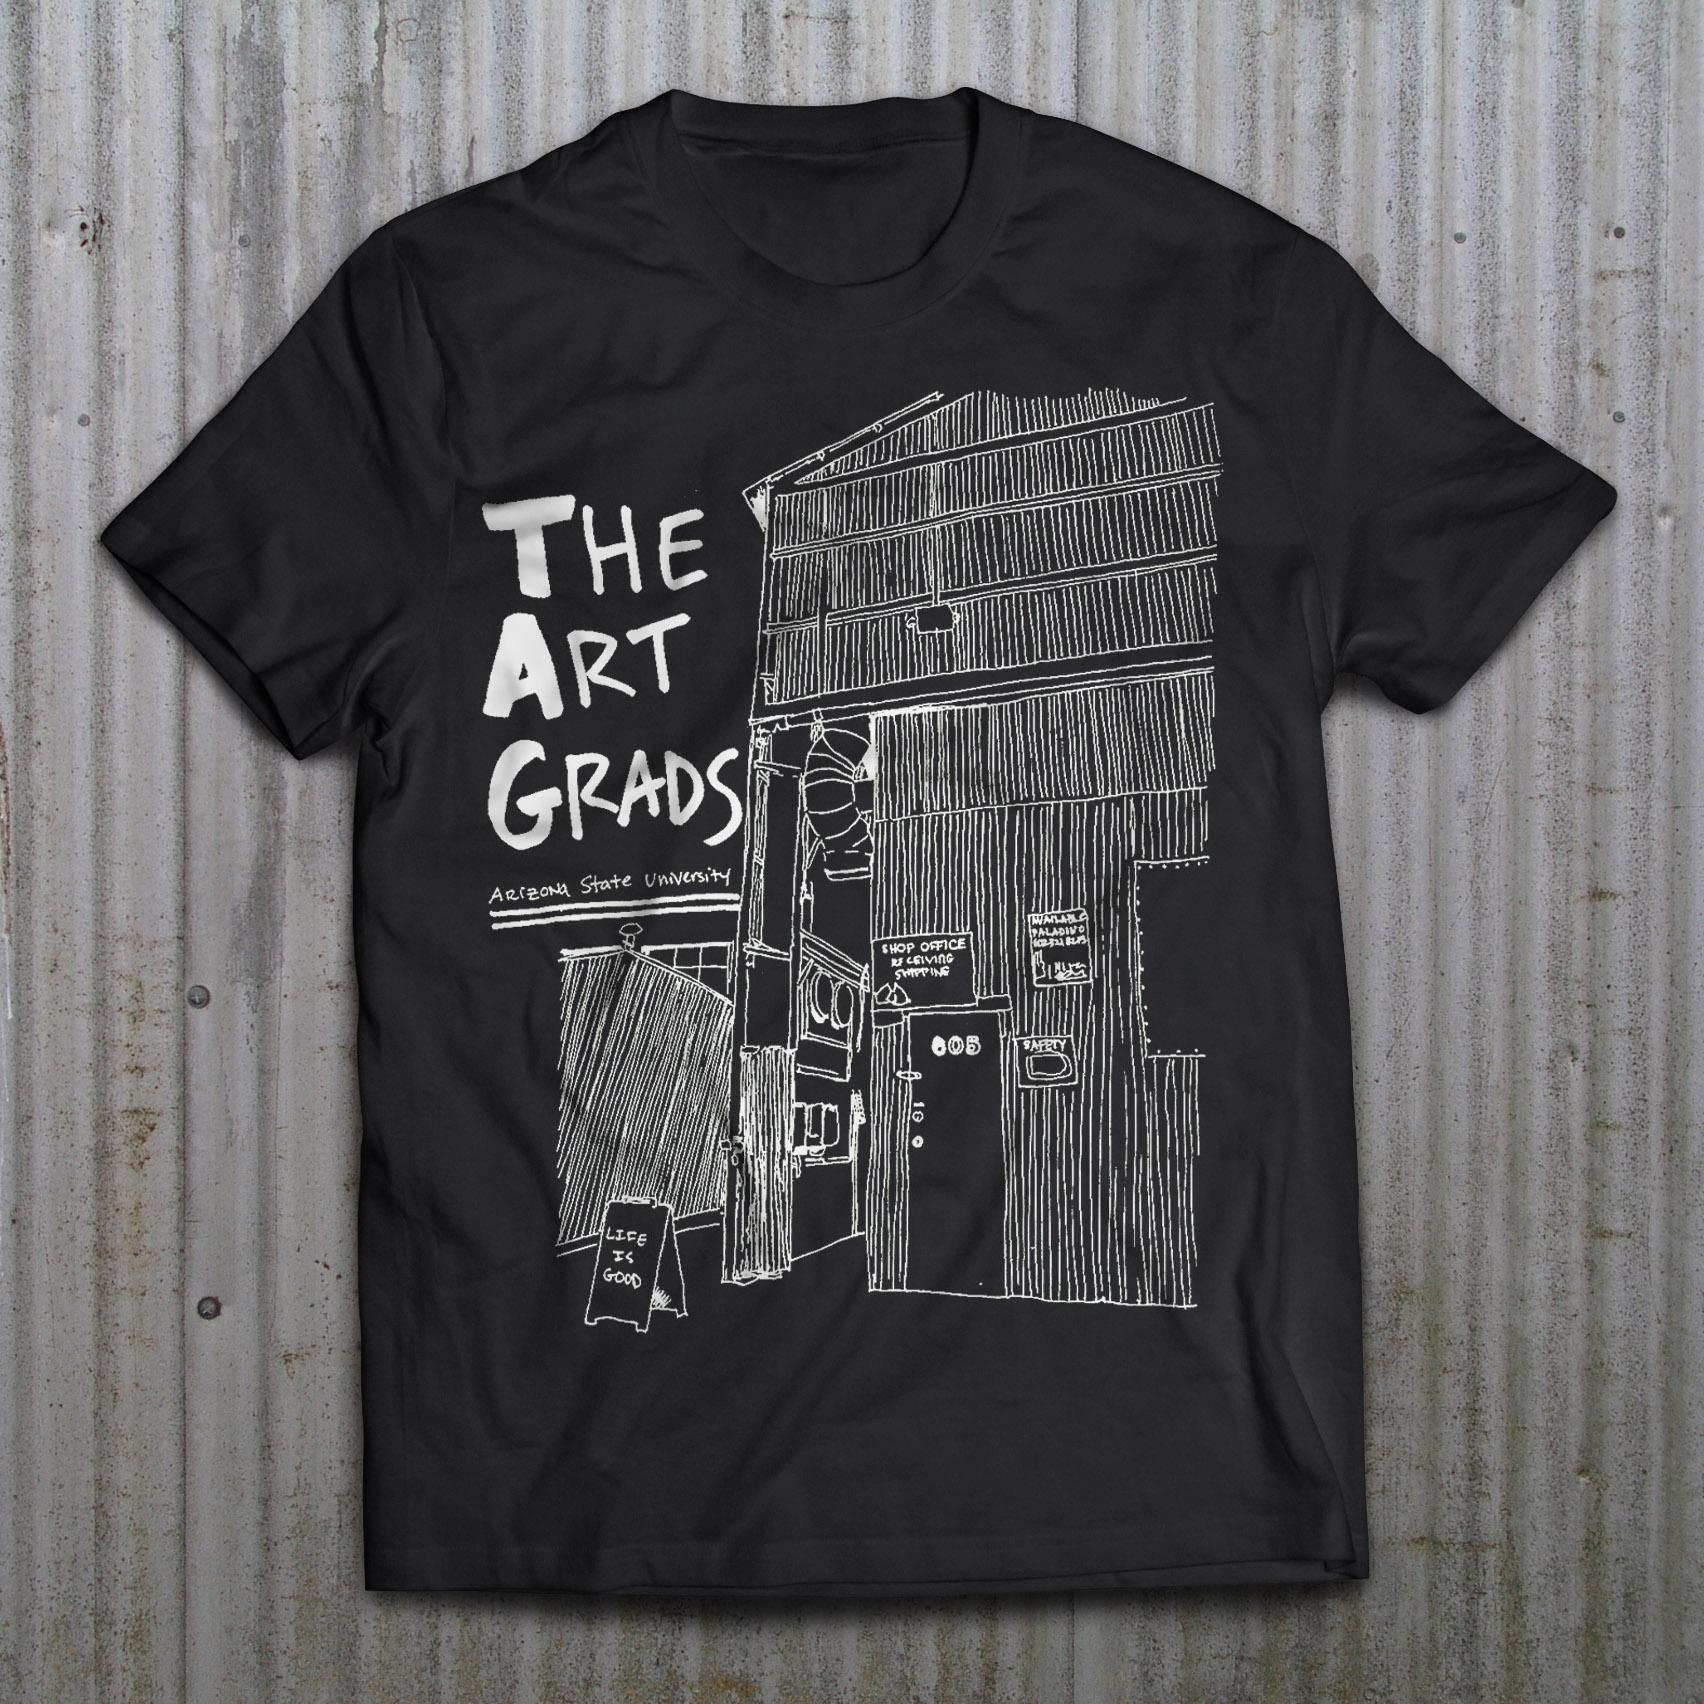 The Art Grads t-shirt design by Kate Horvat